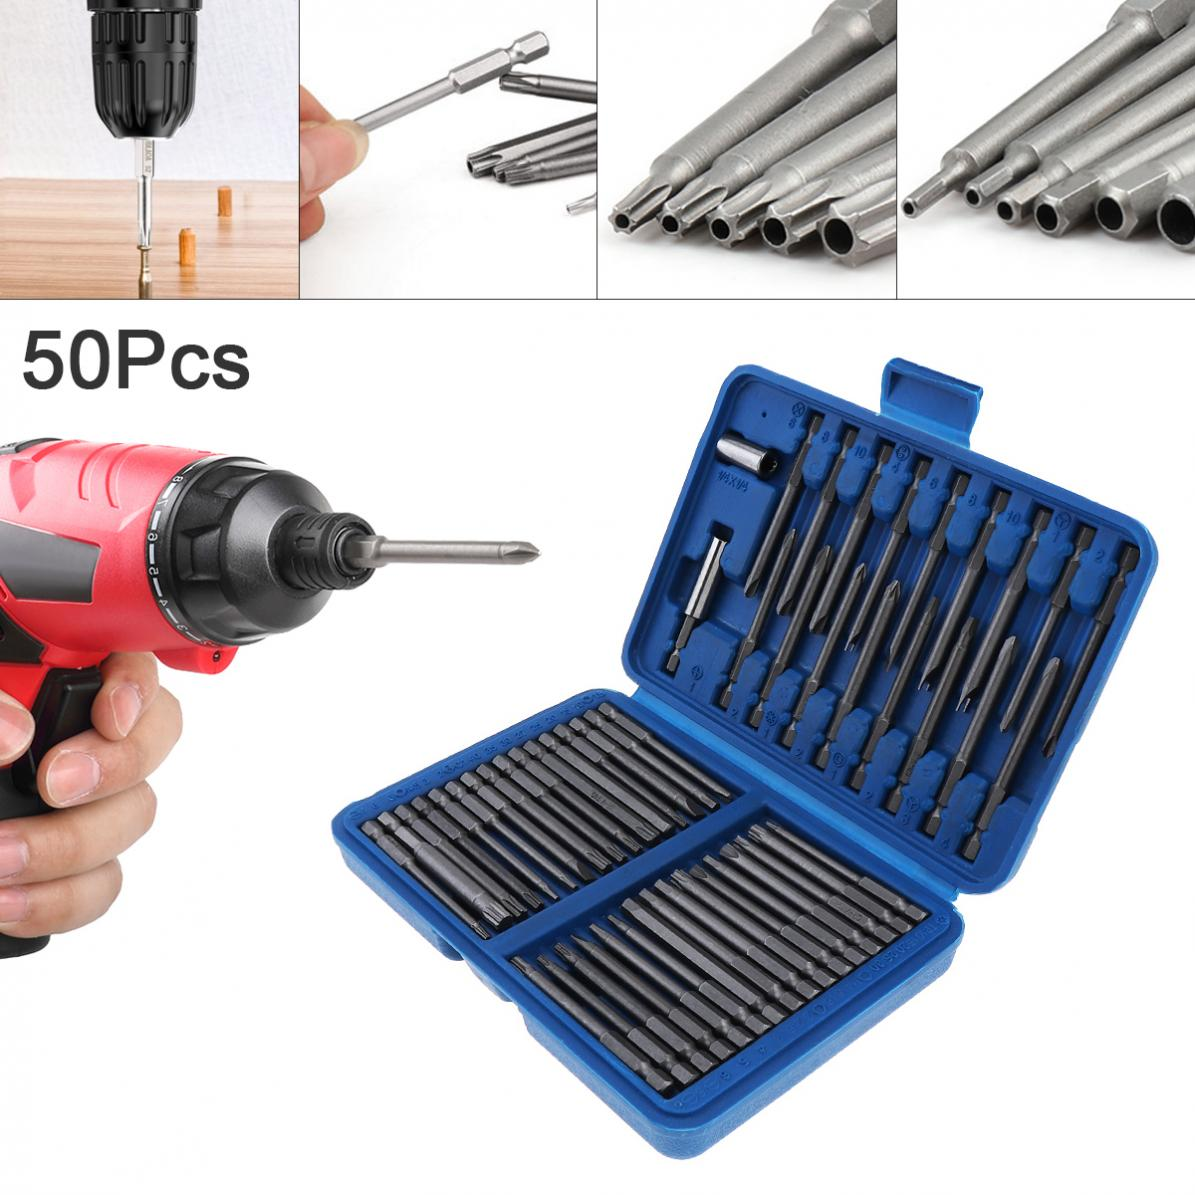 50pcs/lot Screw Head 75MM Extra Long Bits Set Multi-purpose Screwdriver Bit Set Fit For Electric Screwdriver